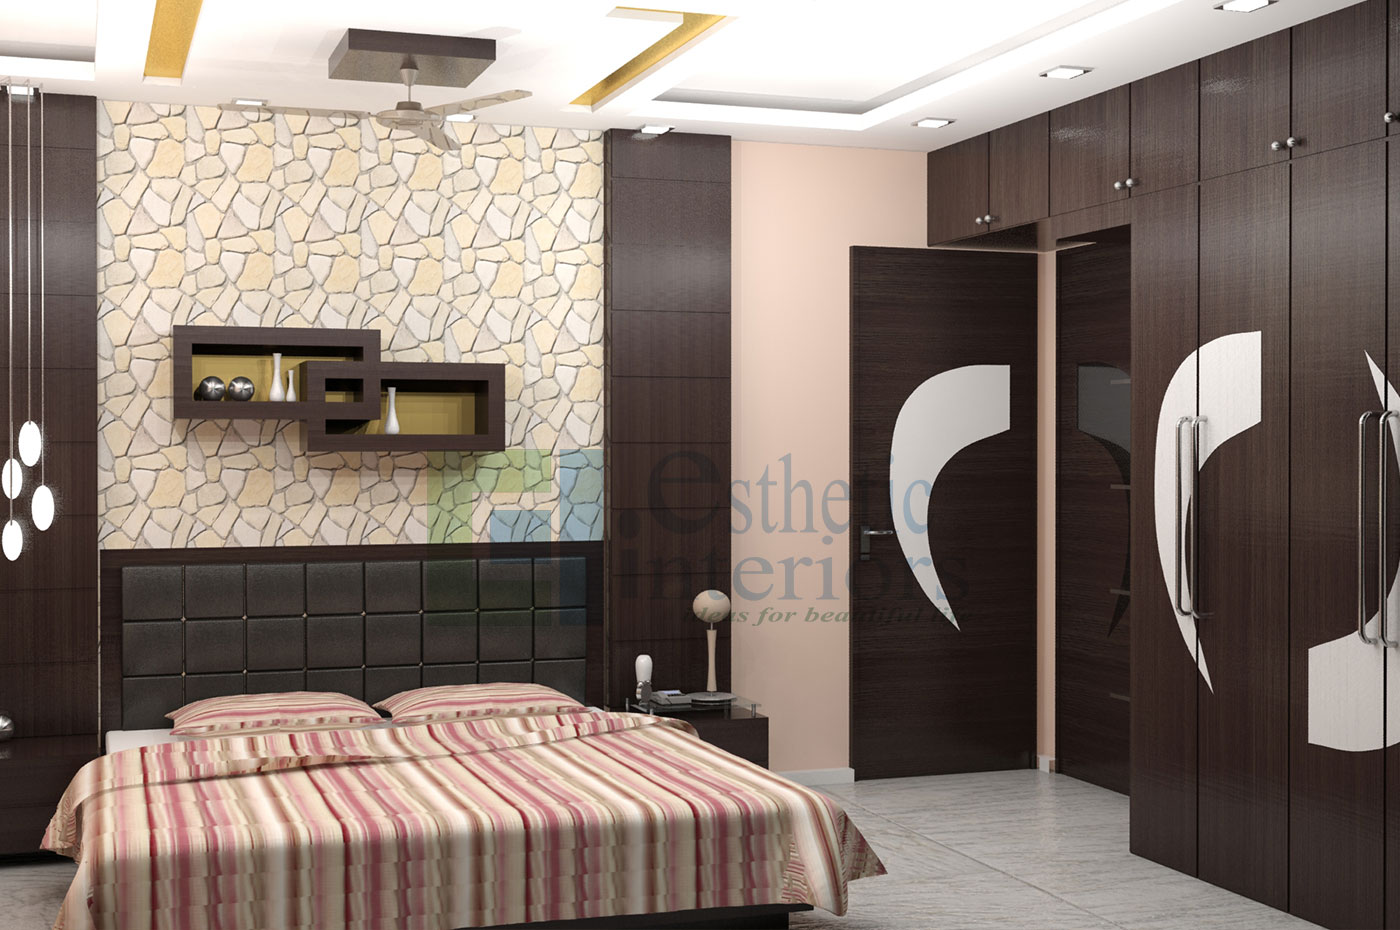 Esthetic Interiors Interior Designing Company In Kolkata